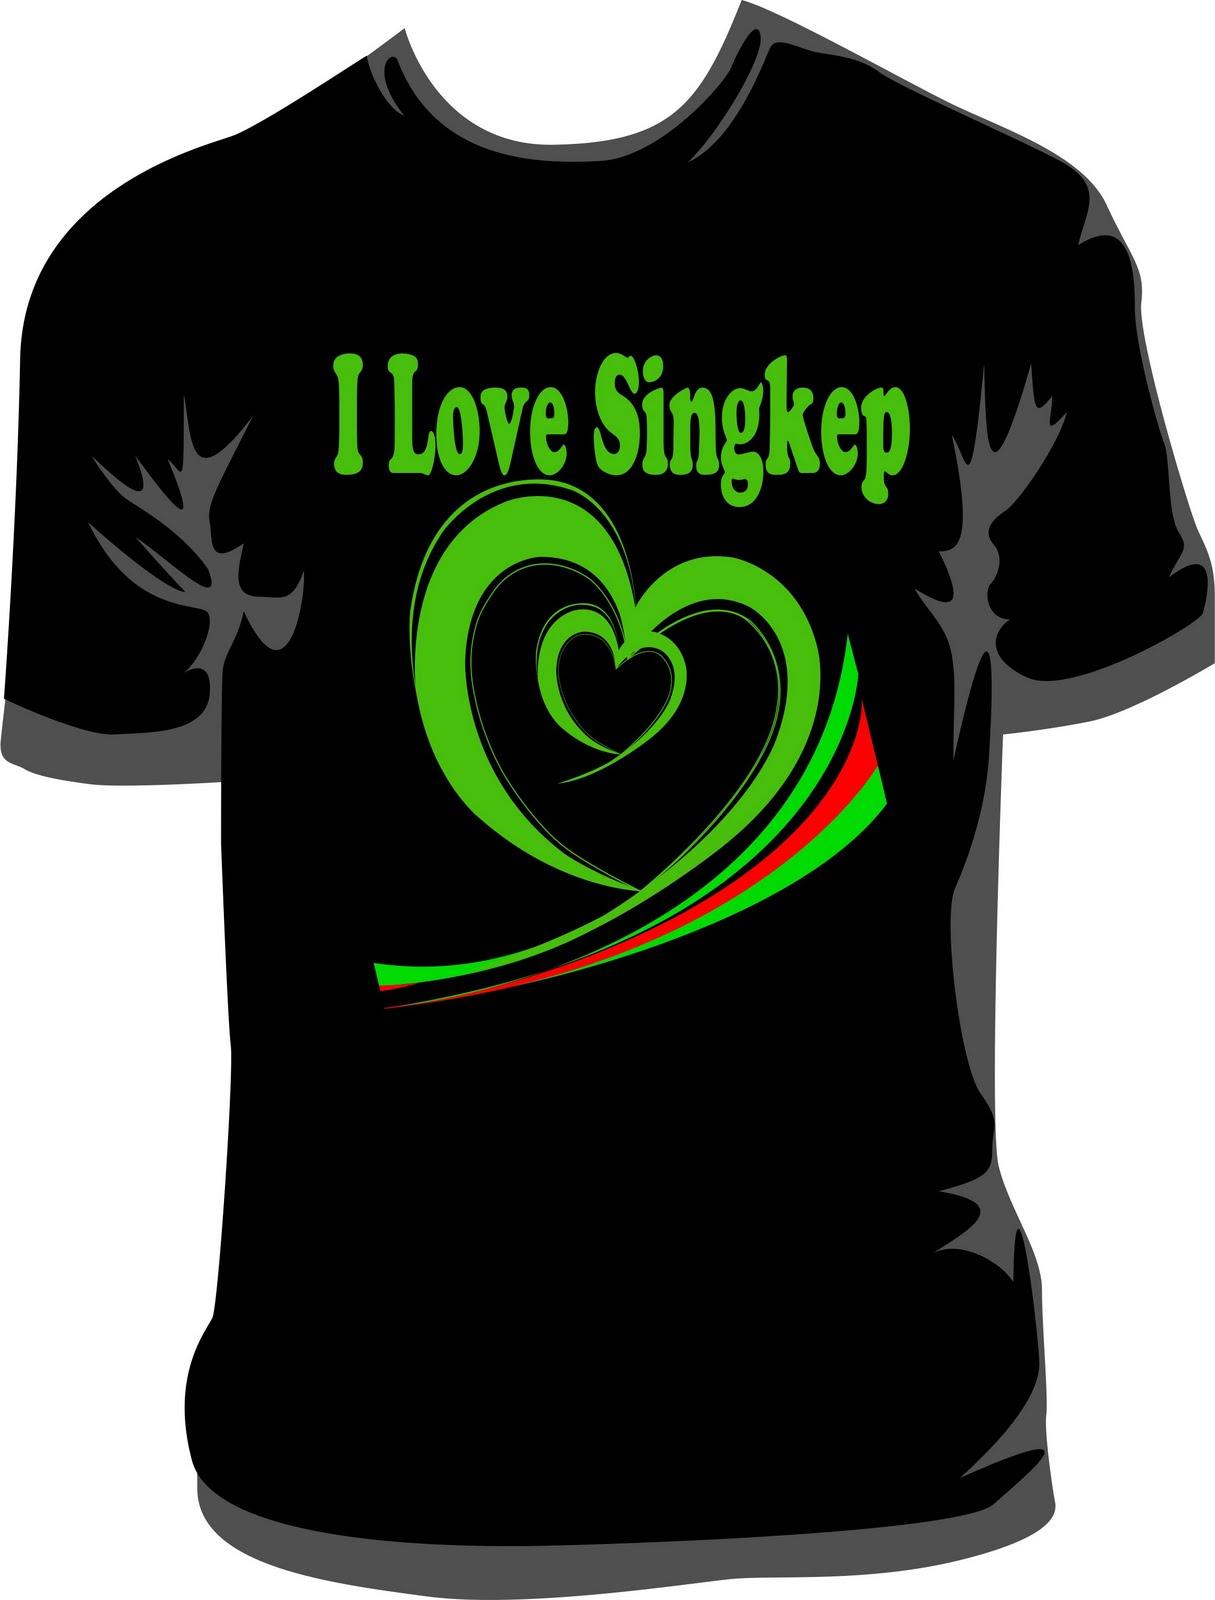 Contoh Desain Baju Kaos Terbaru 2012| Desain Kaos Singkep